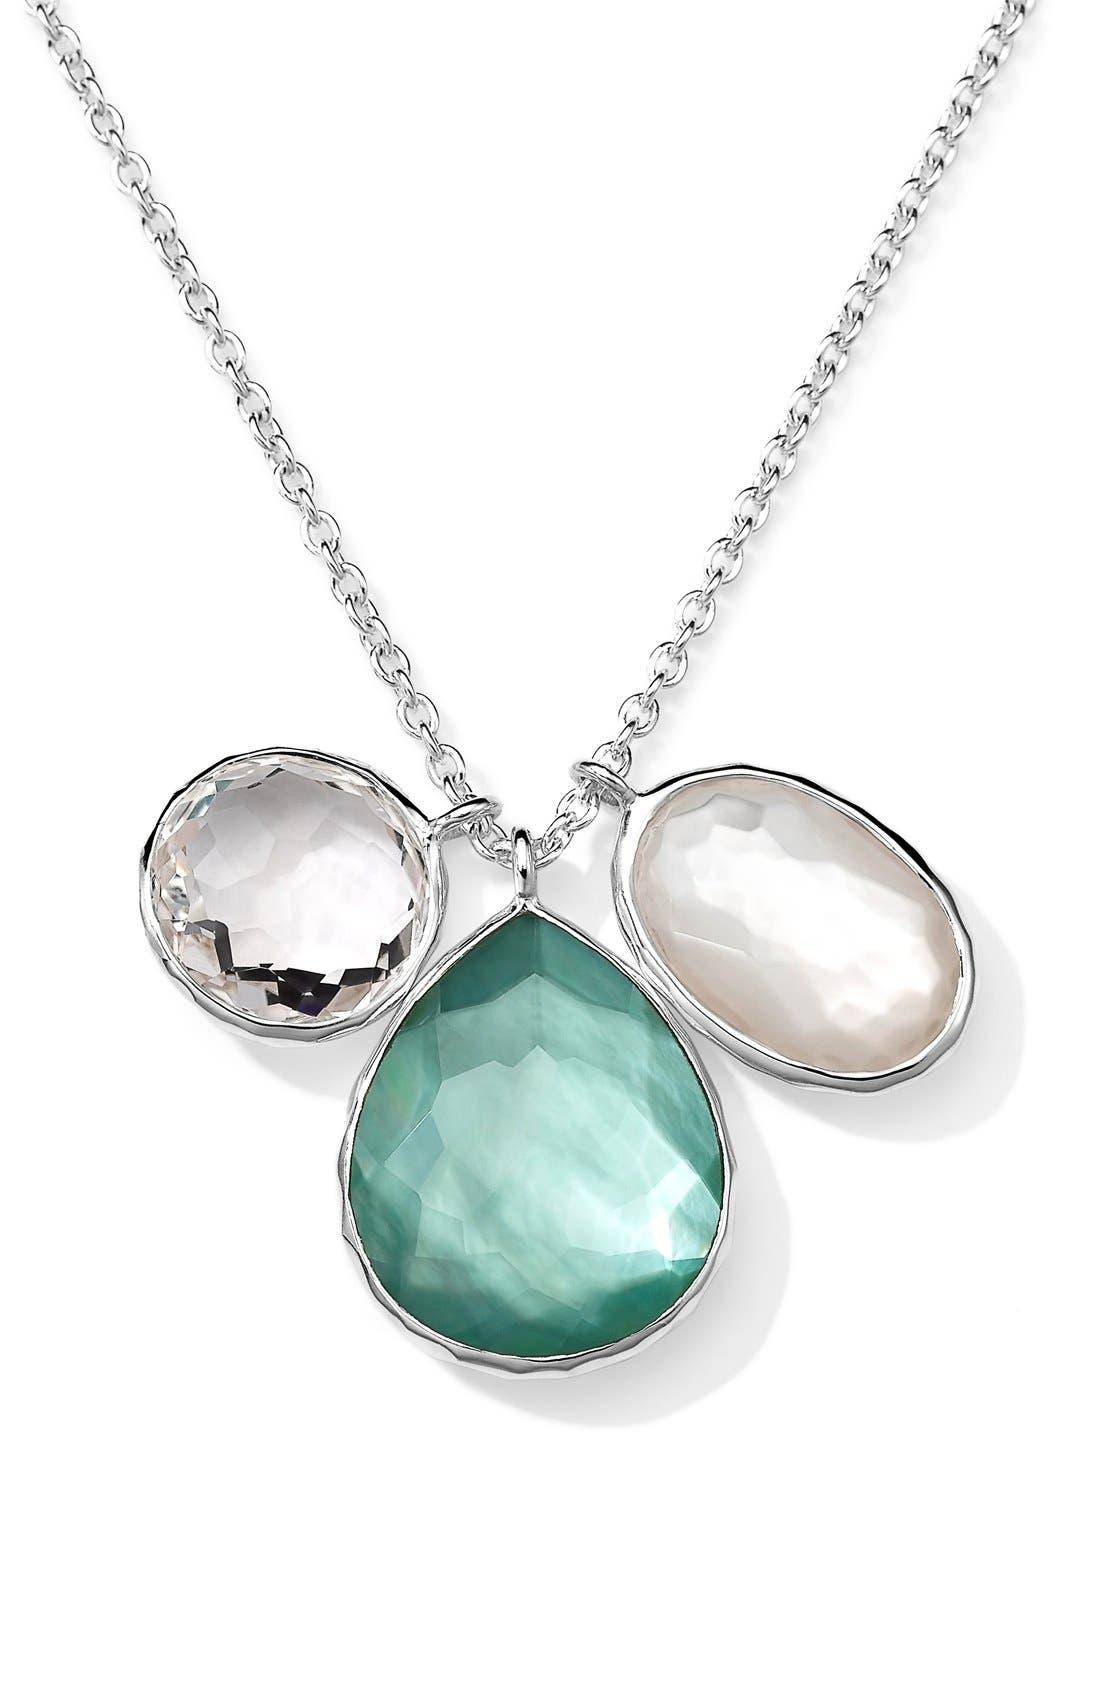 Main Image - Ippolita 'Wonderland' Cluster Pendant Necklace